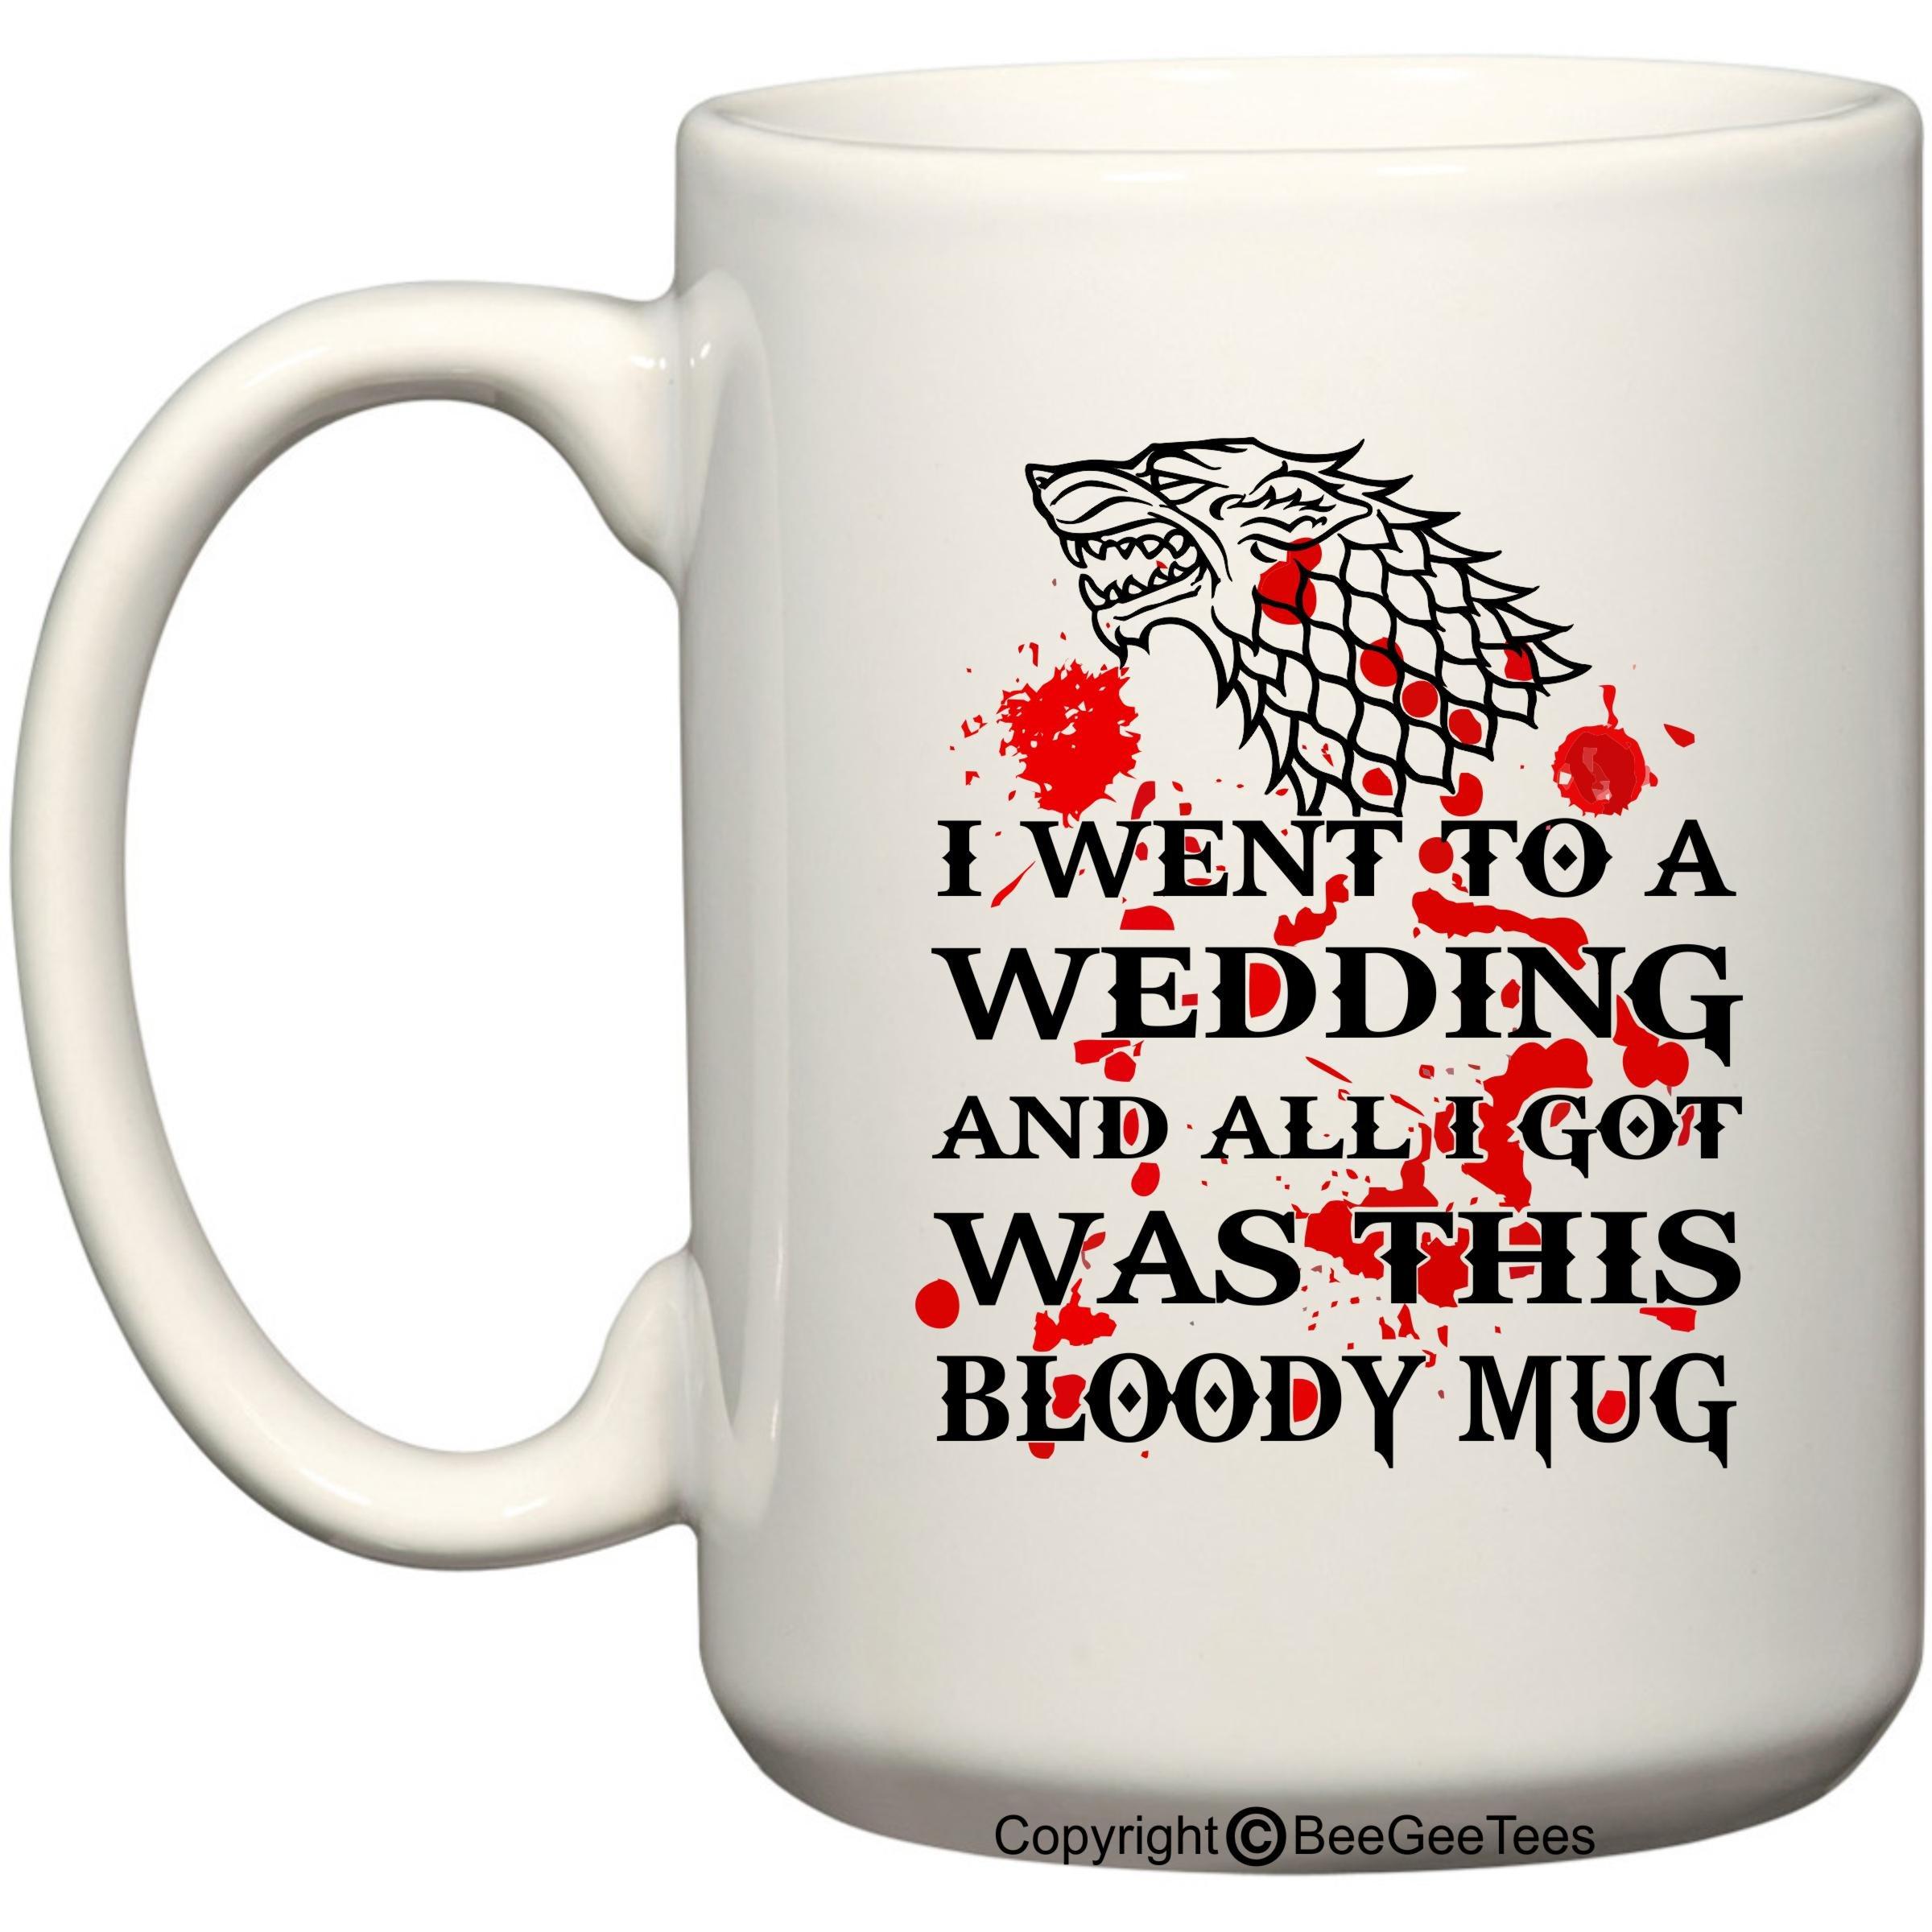 Game of Thrones Wedding - Dire Wolf Bloody Mug - Coffee or Tea Cup 11 / 15 oz by BeeGeeTees® (15 oz)